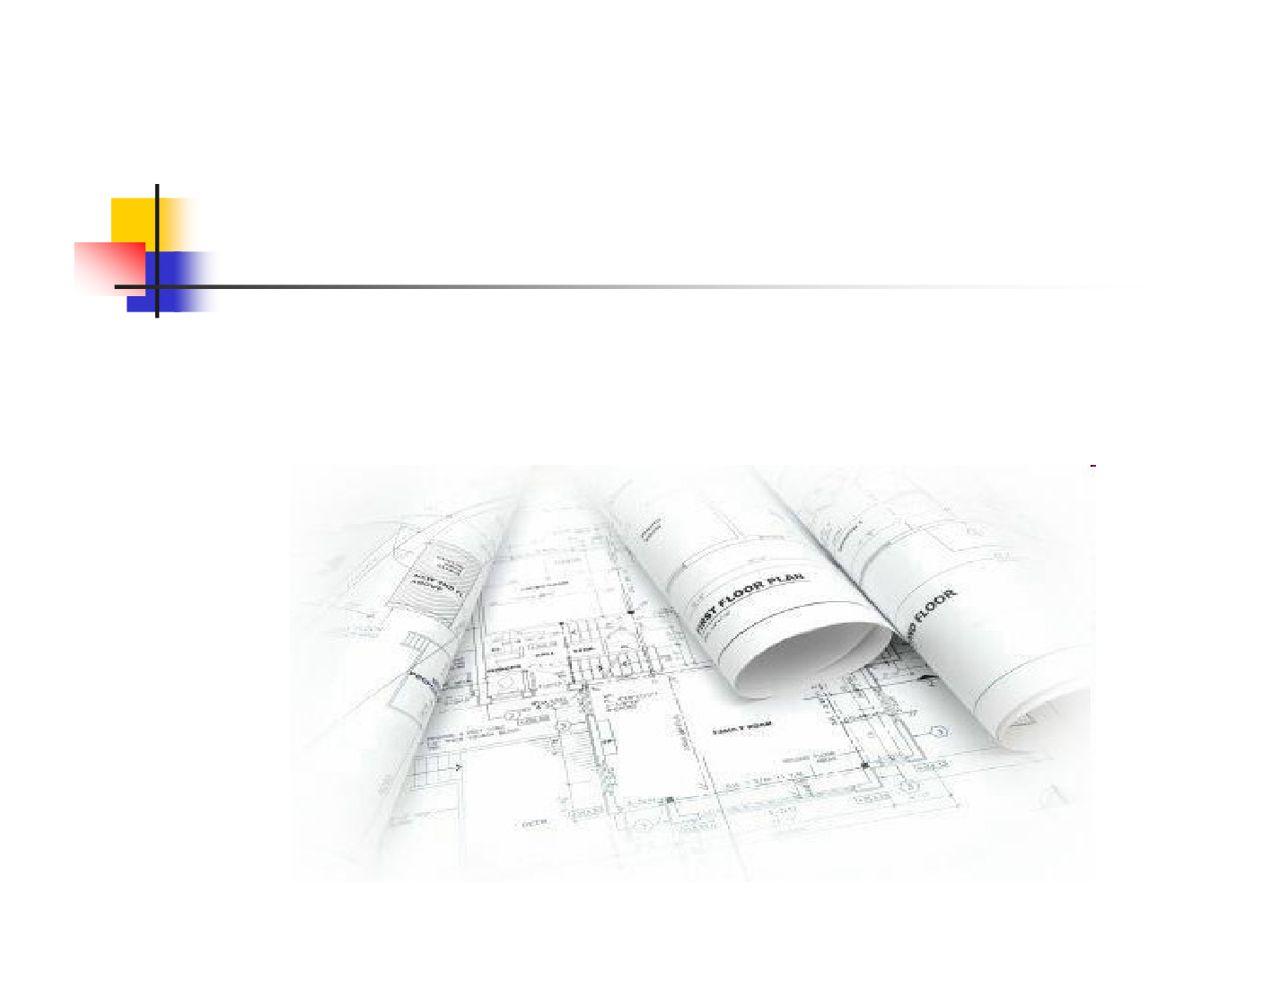 background-powerpoint-dep-cho-bay-thuyet-trinh-chuyen-nghiep-19